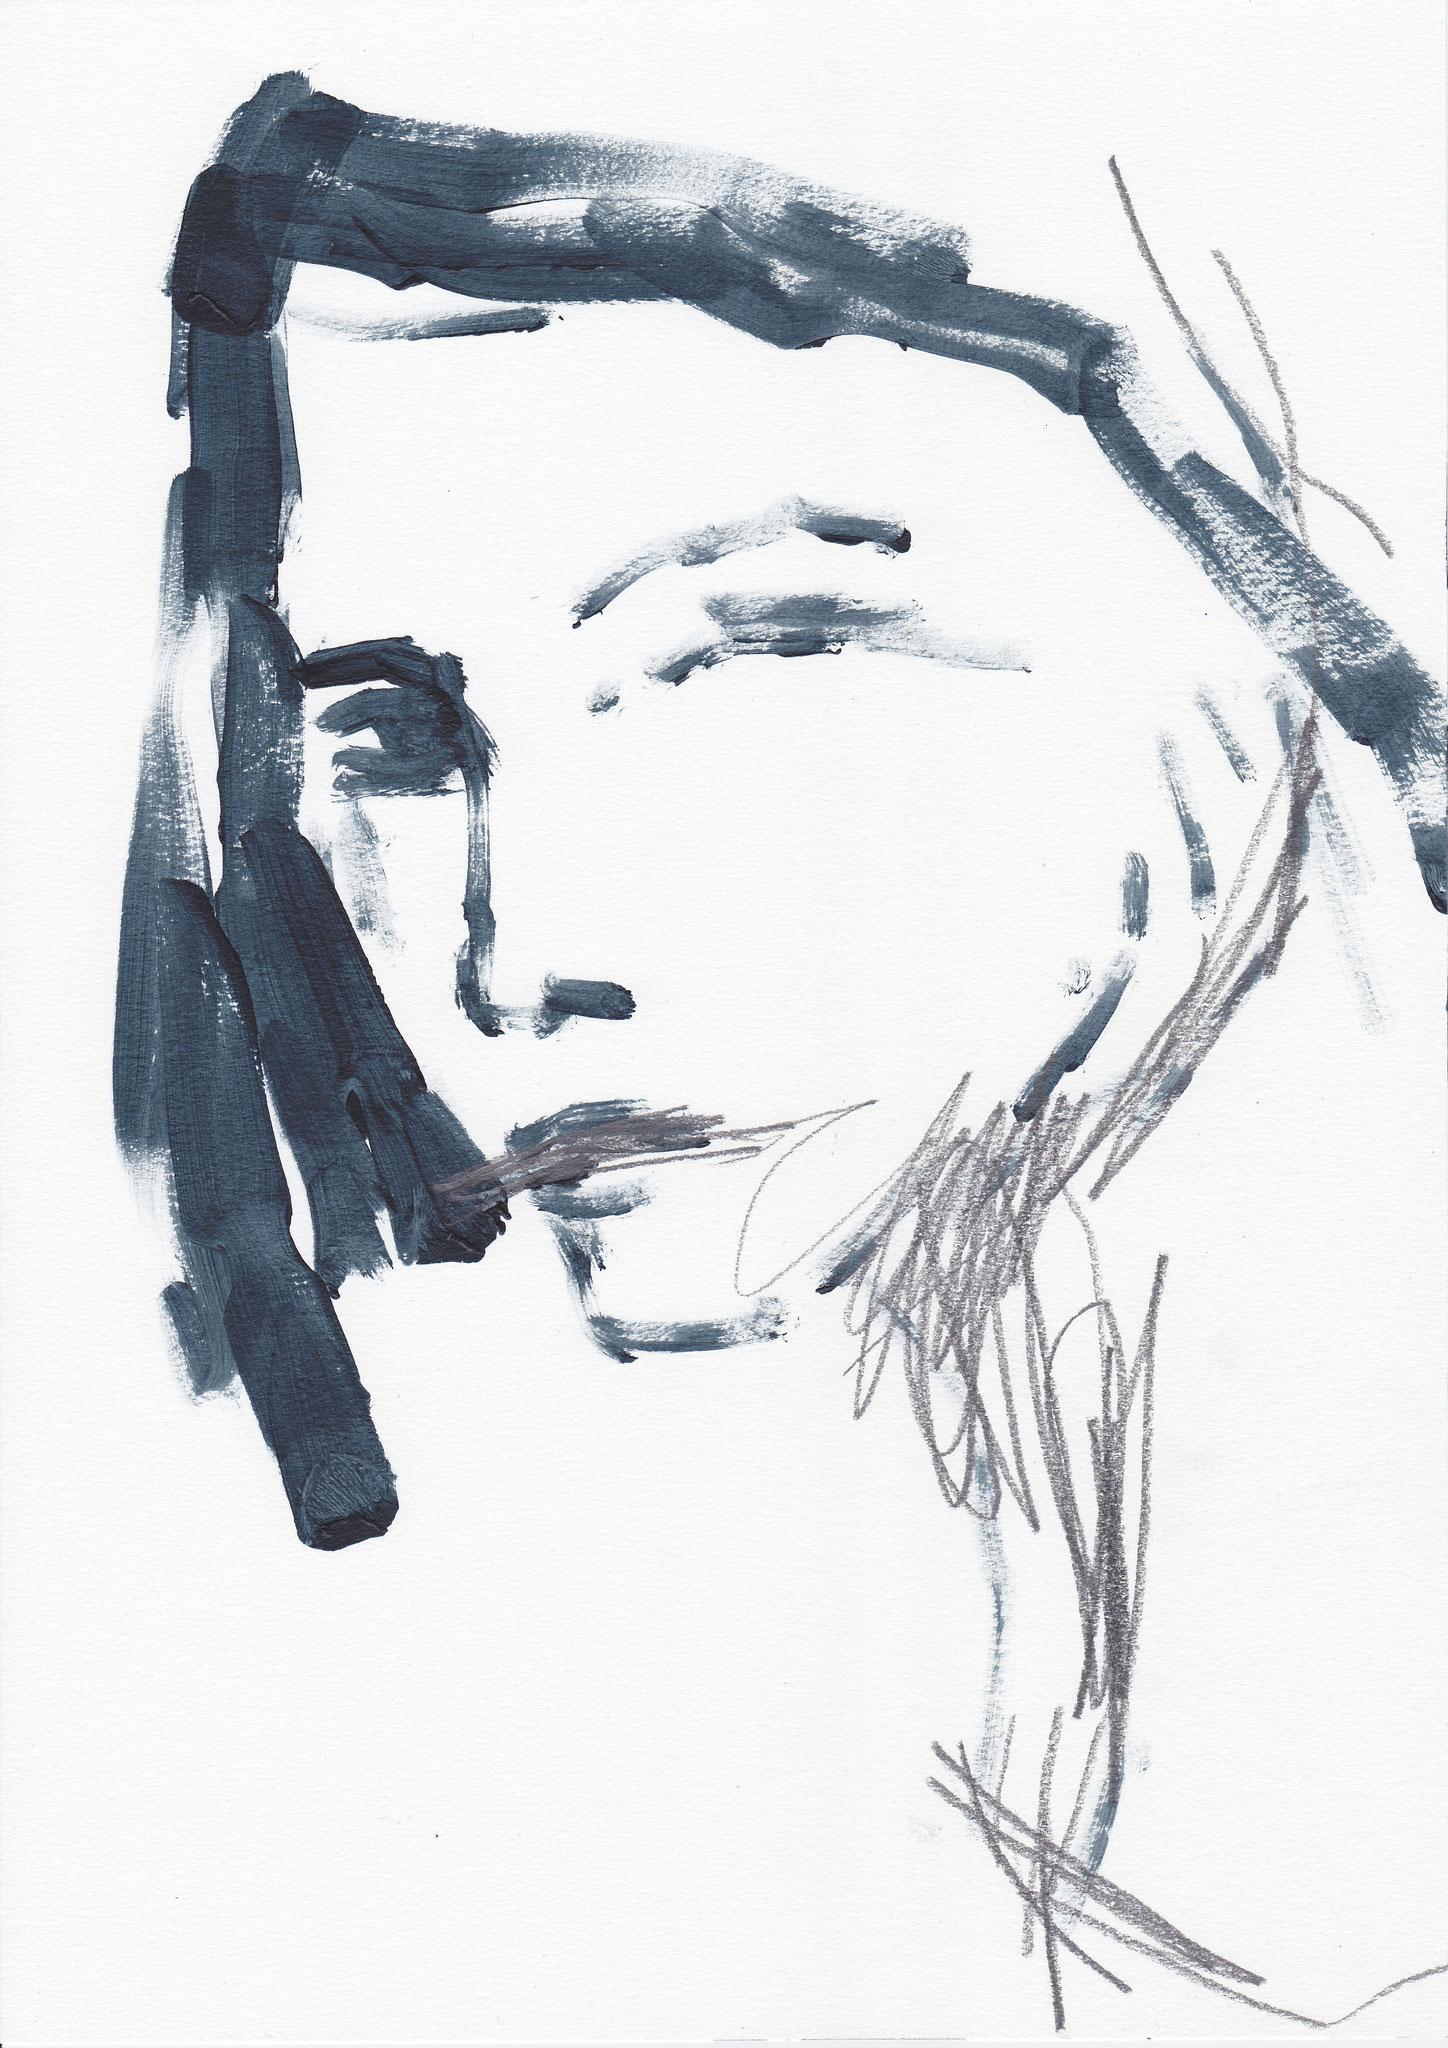 083 , acrylic on paper , 29.7 x 21cm , Selina Saranova